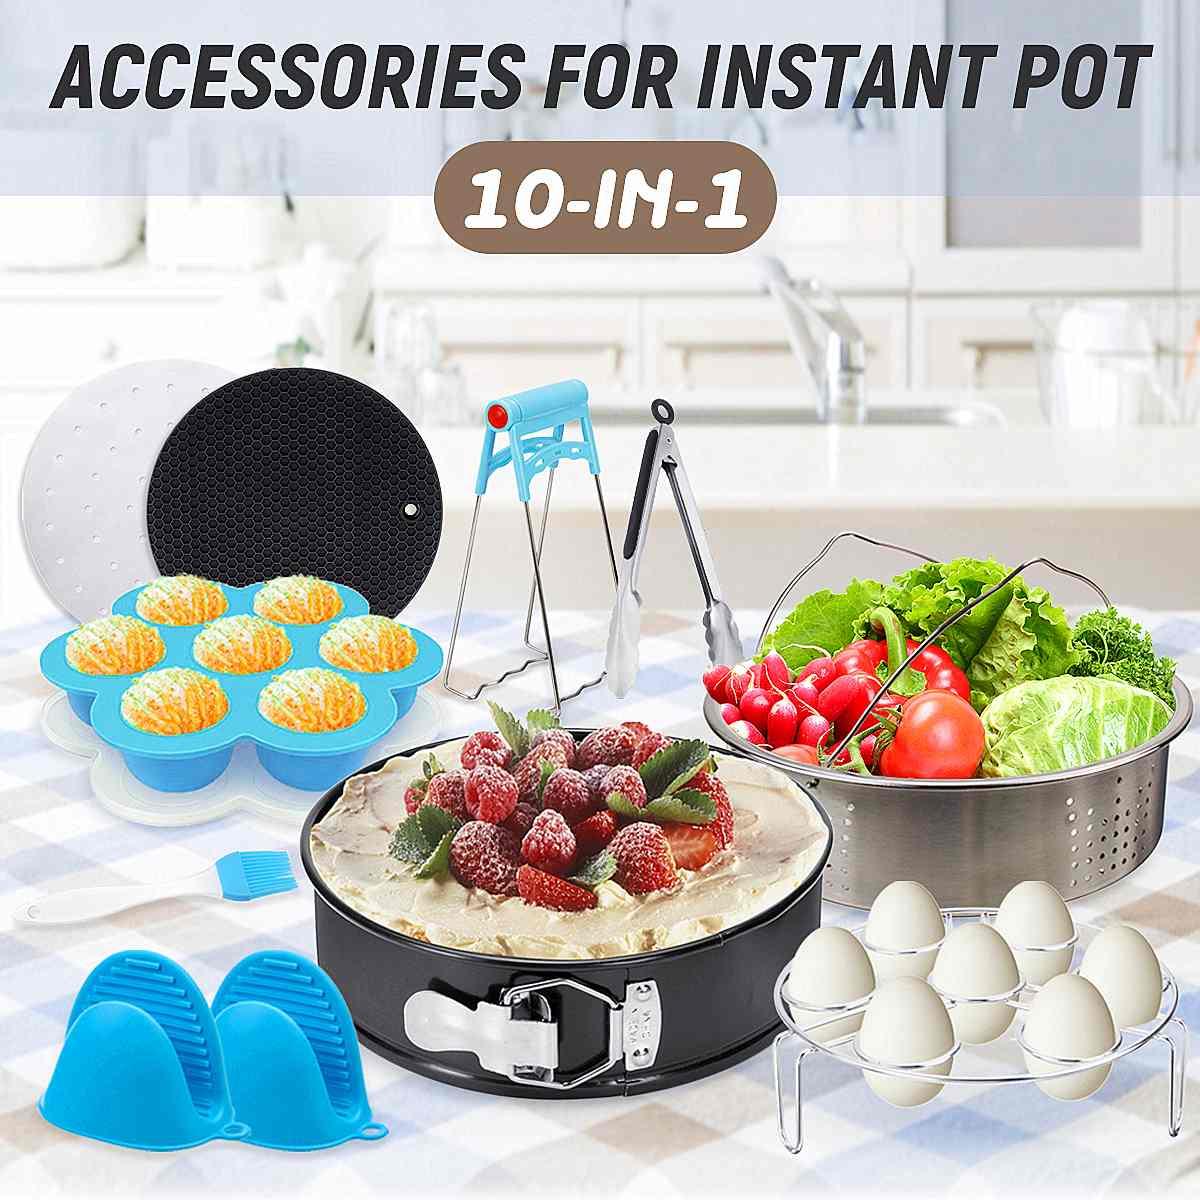 New 10Pcs Instant Pot Accessories Set Electric Pressure Cooker Accessories Parts Steamer Basket Springform Pan Silicone Mat Kit